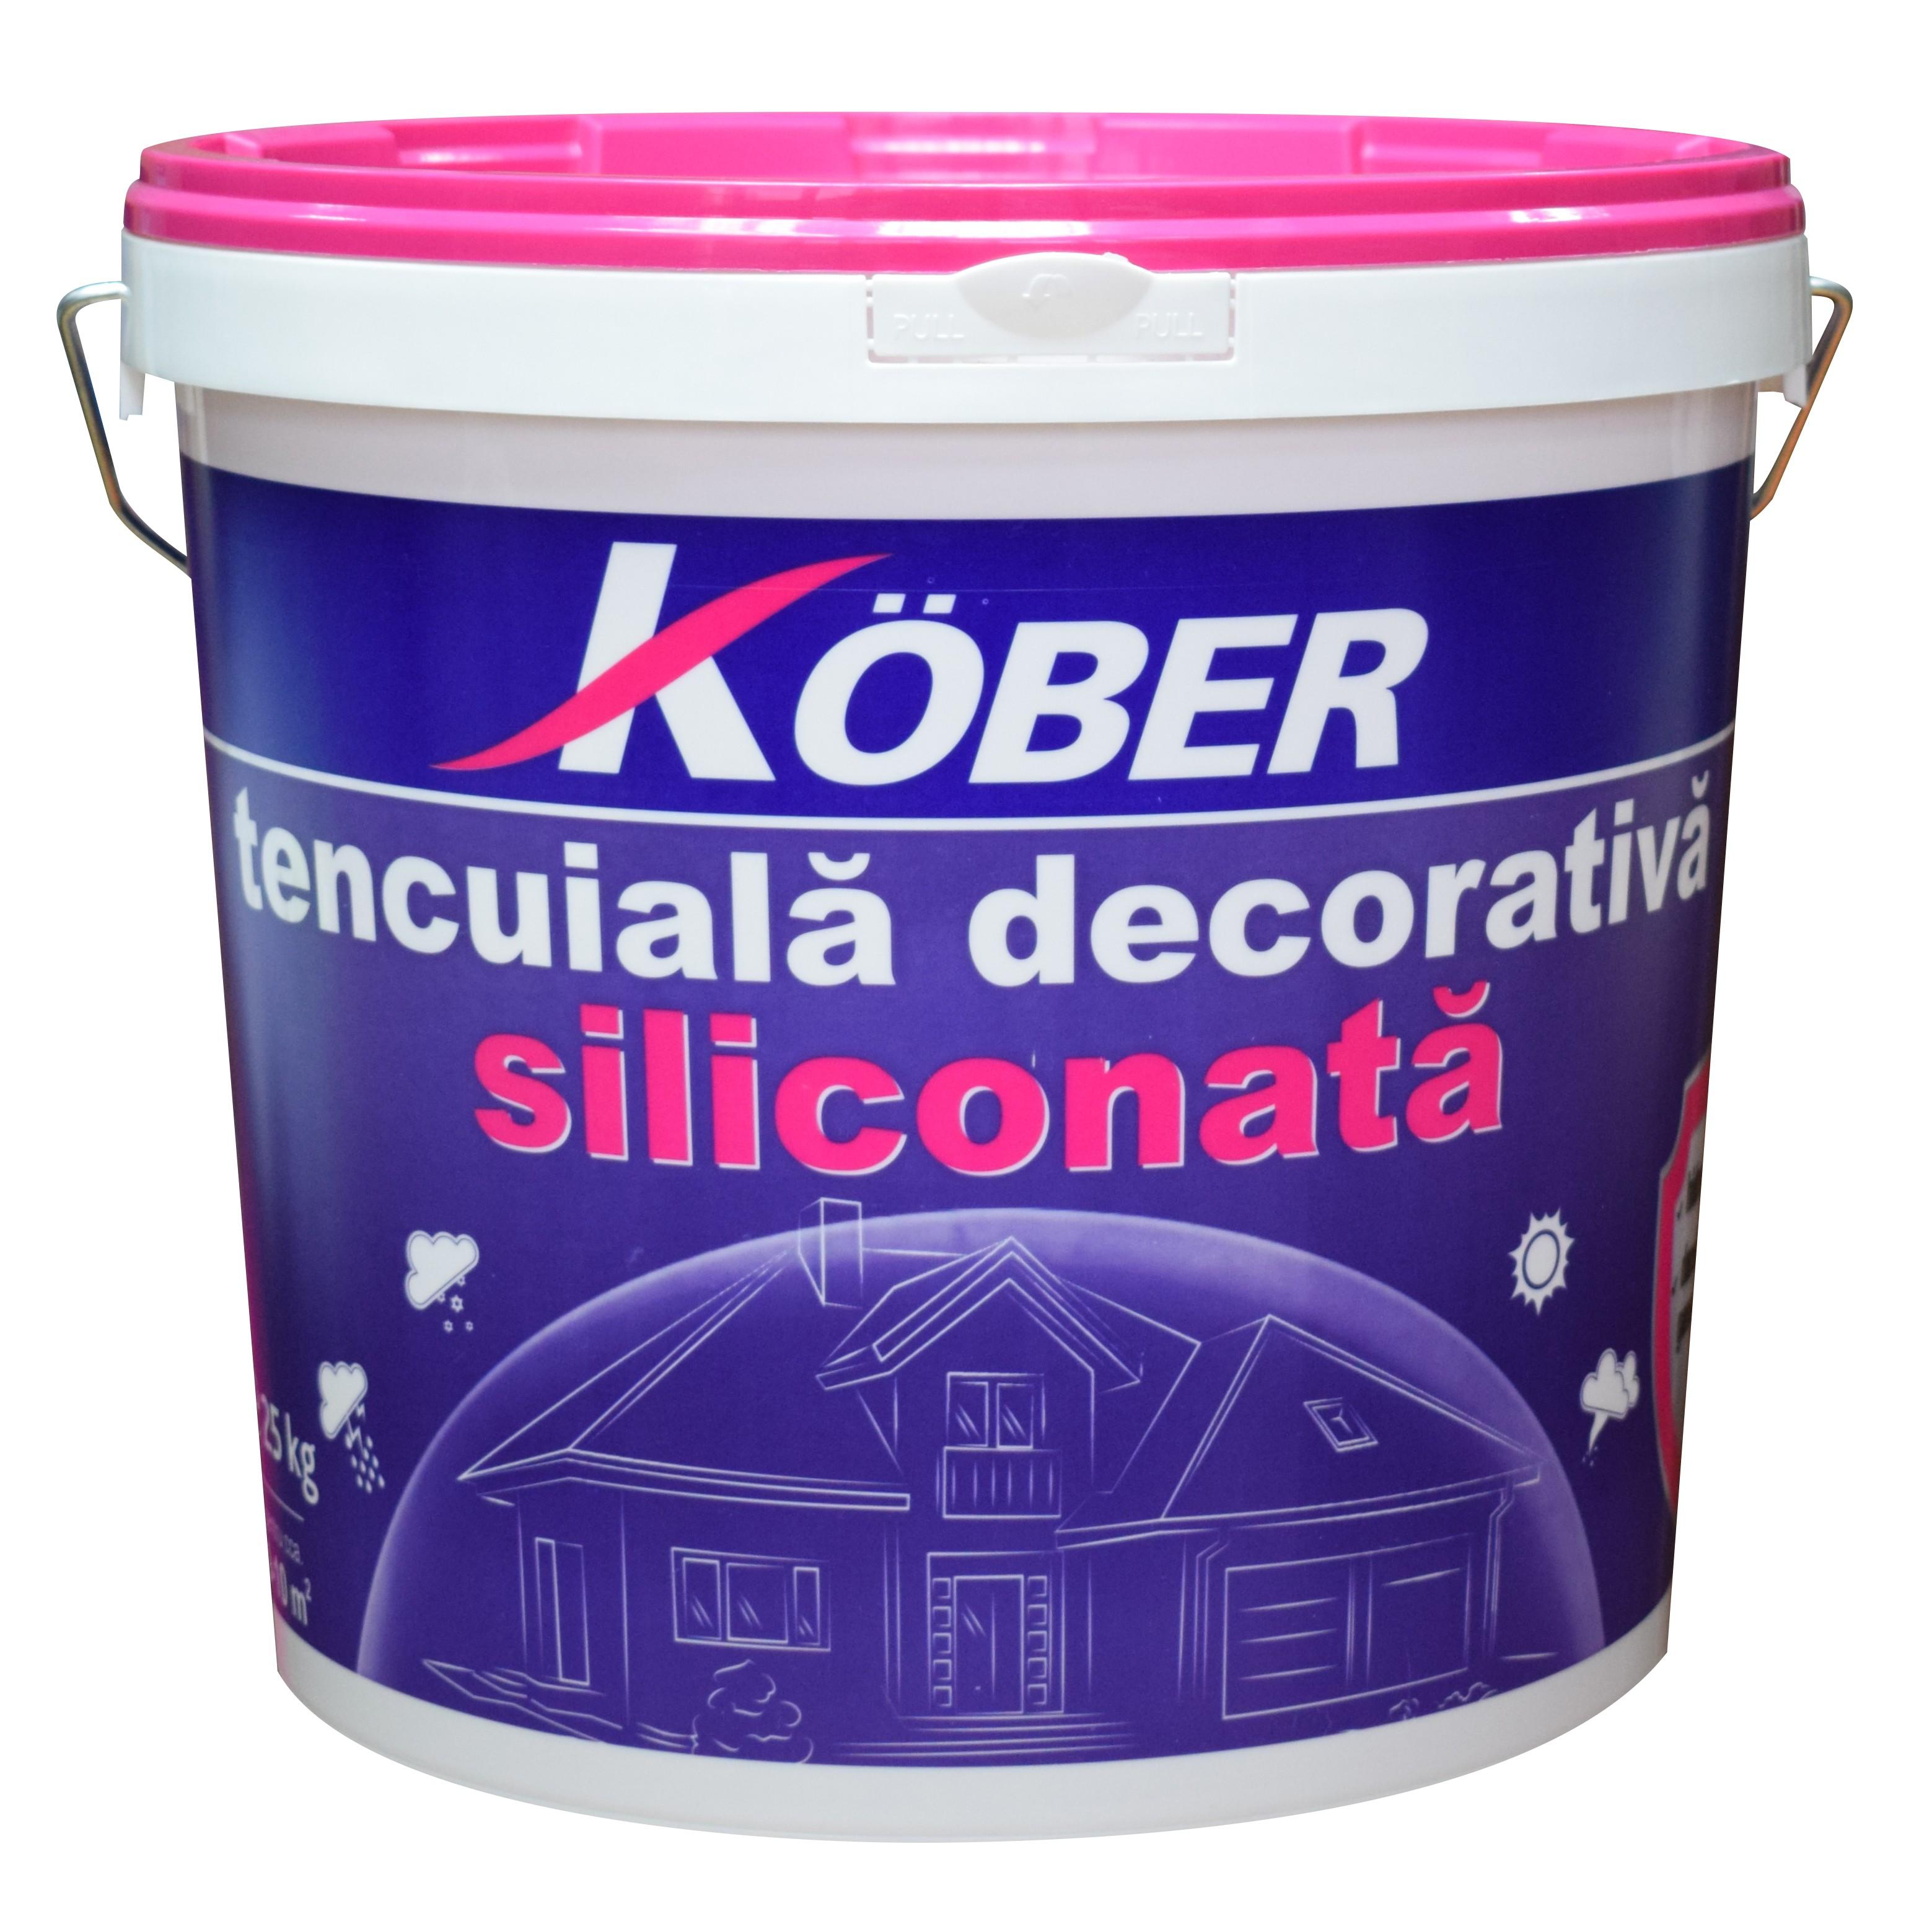 Tencuiala Decorativa Sauber Dekor.Dedeman Tencuiala Decorativa Siliconata Kober Profesional 1 5 Mm